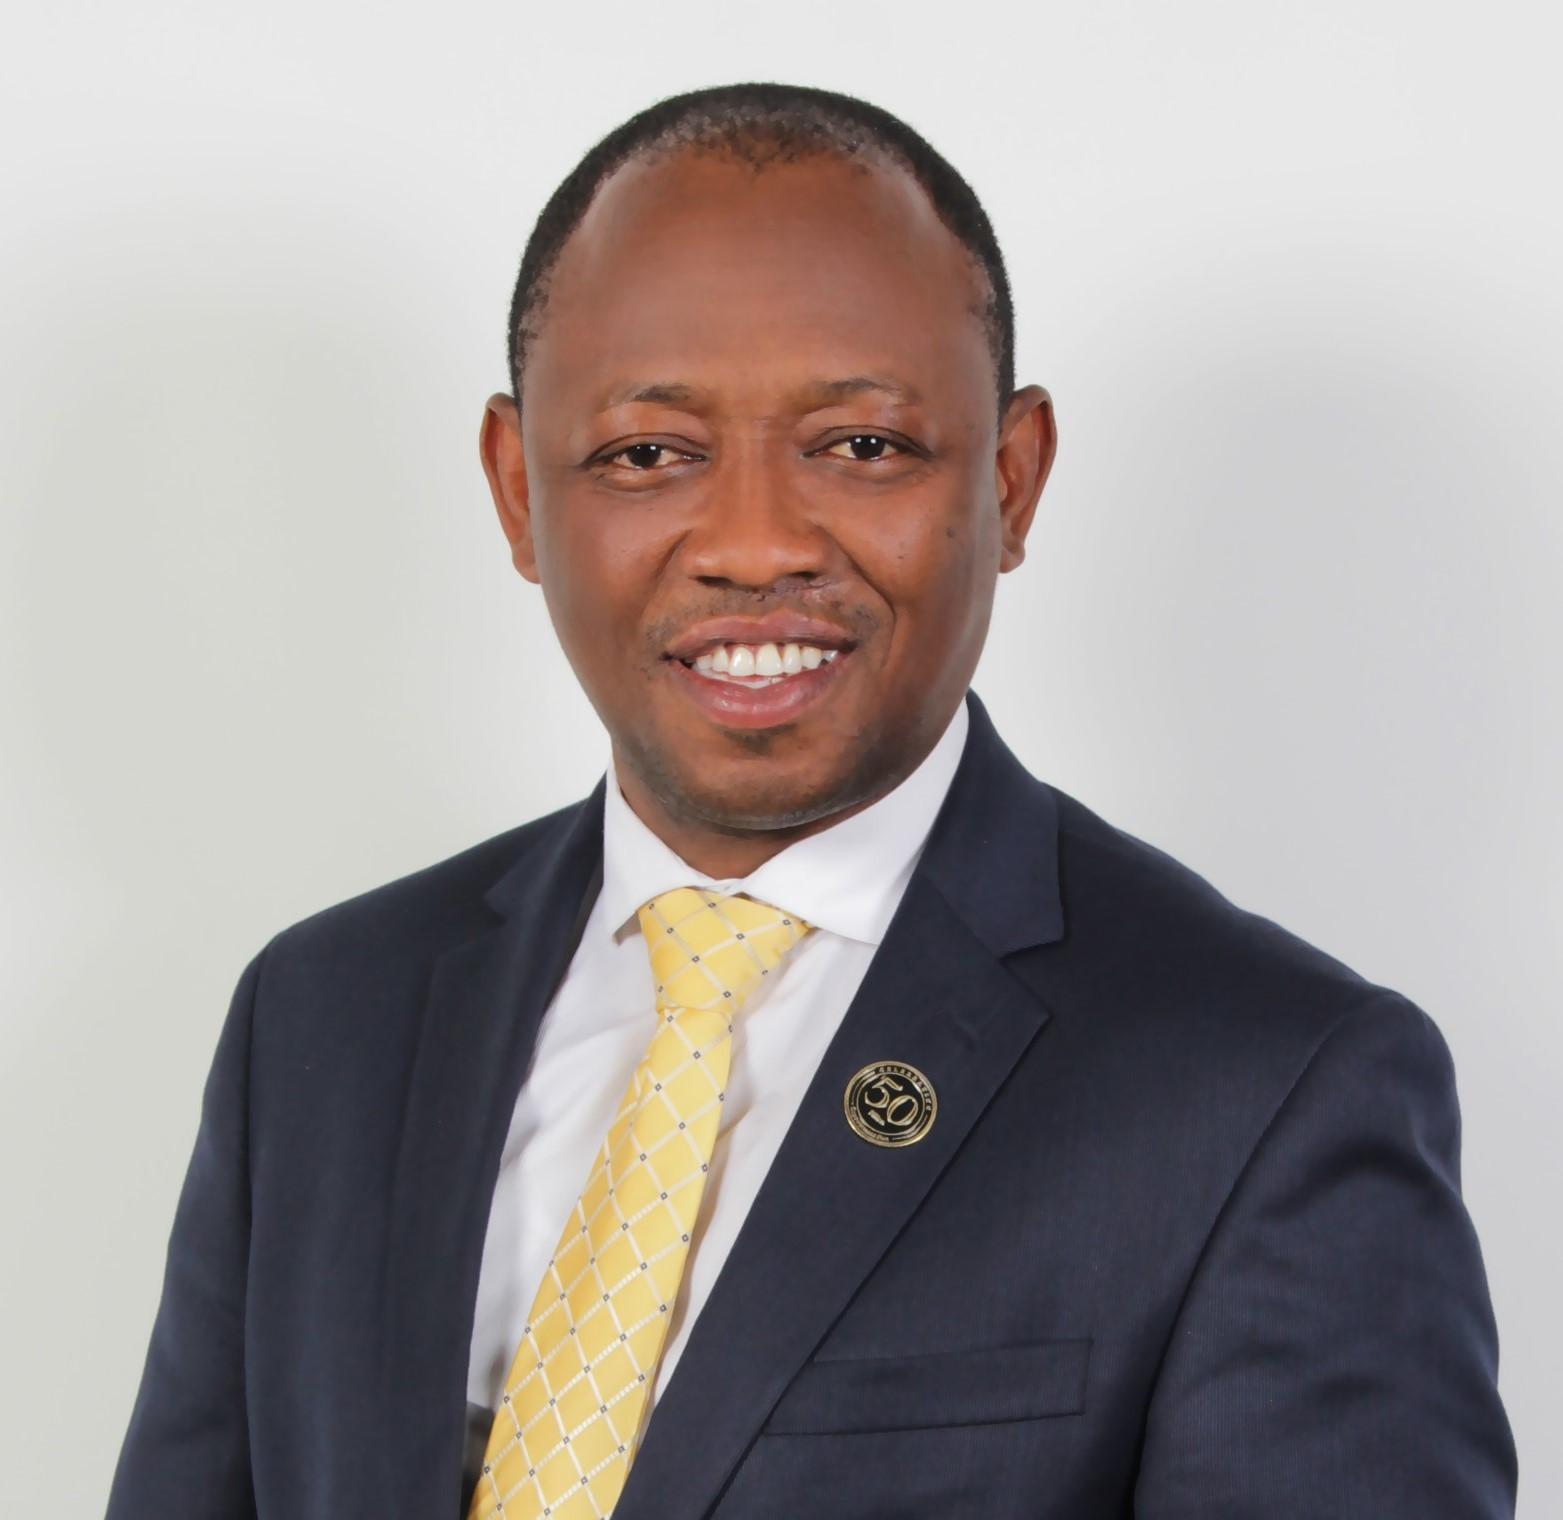 JAMES OSEI-OWUSU  Your Financial Professional & Insurance Agent